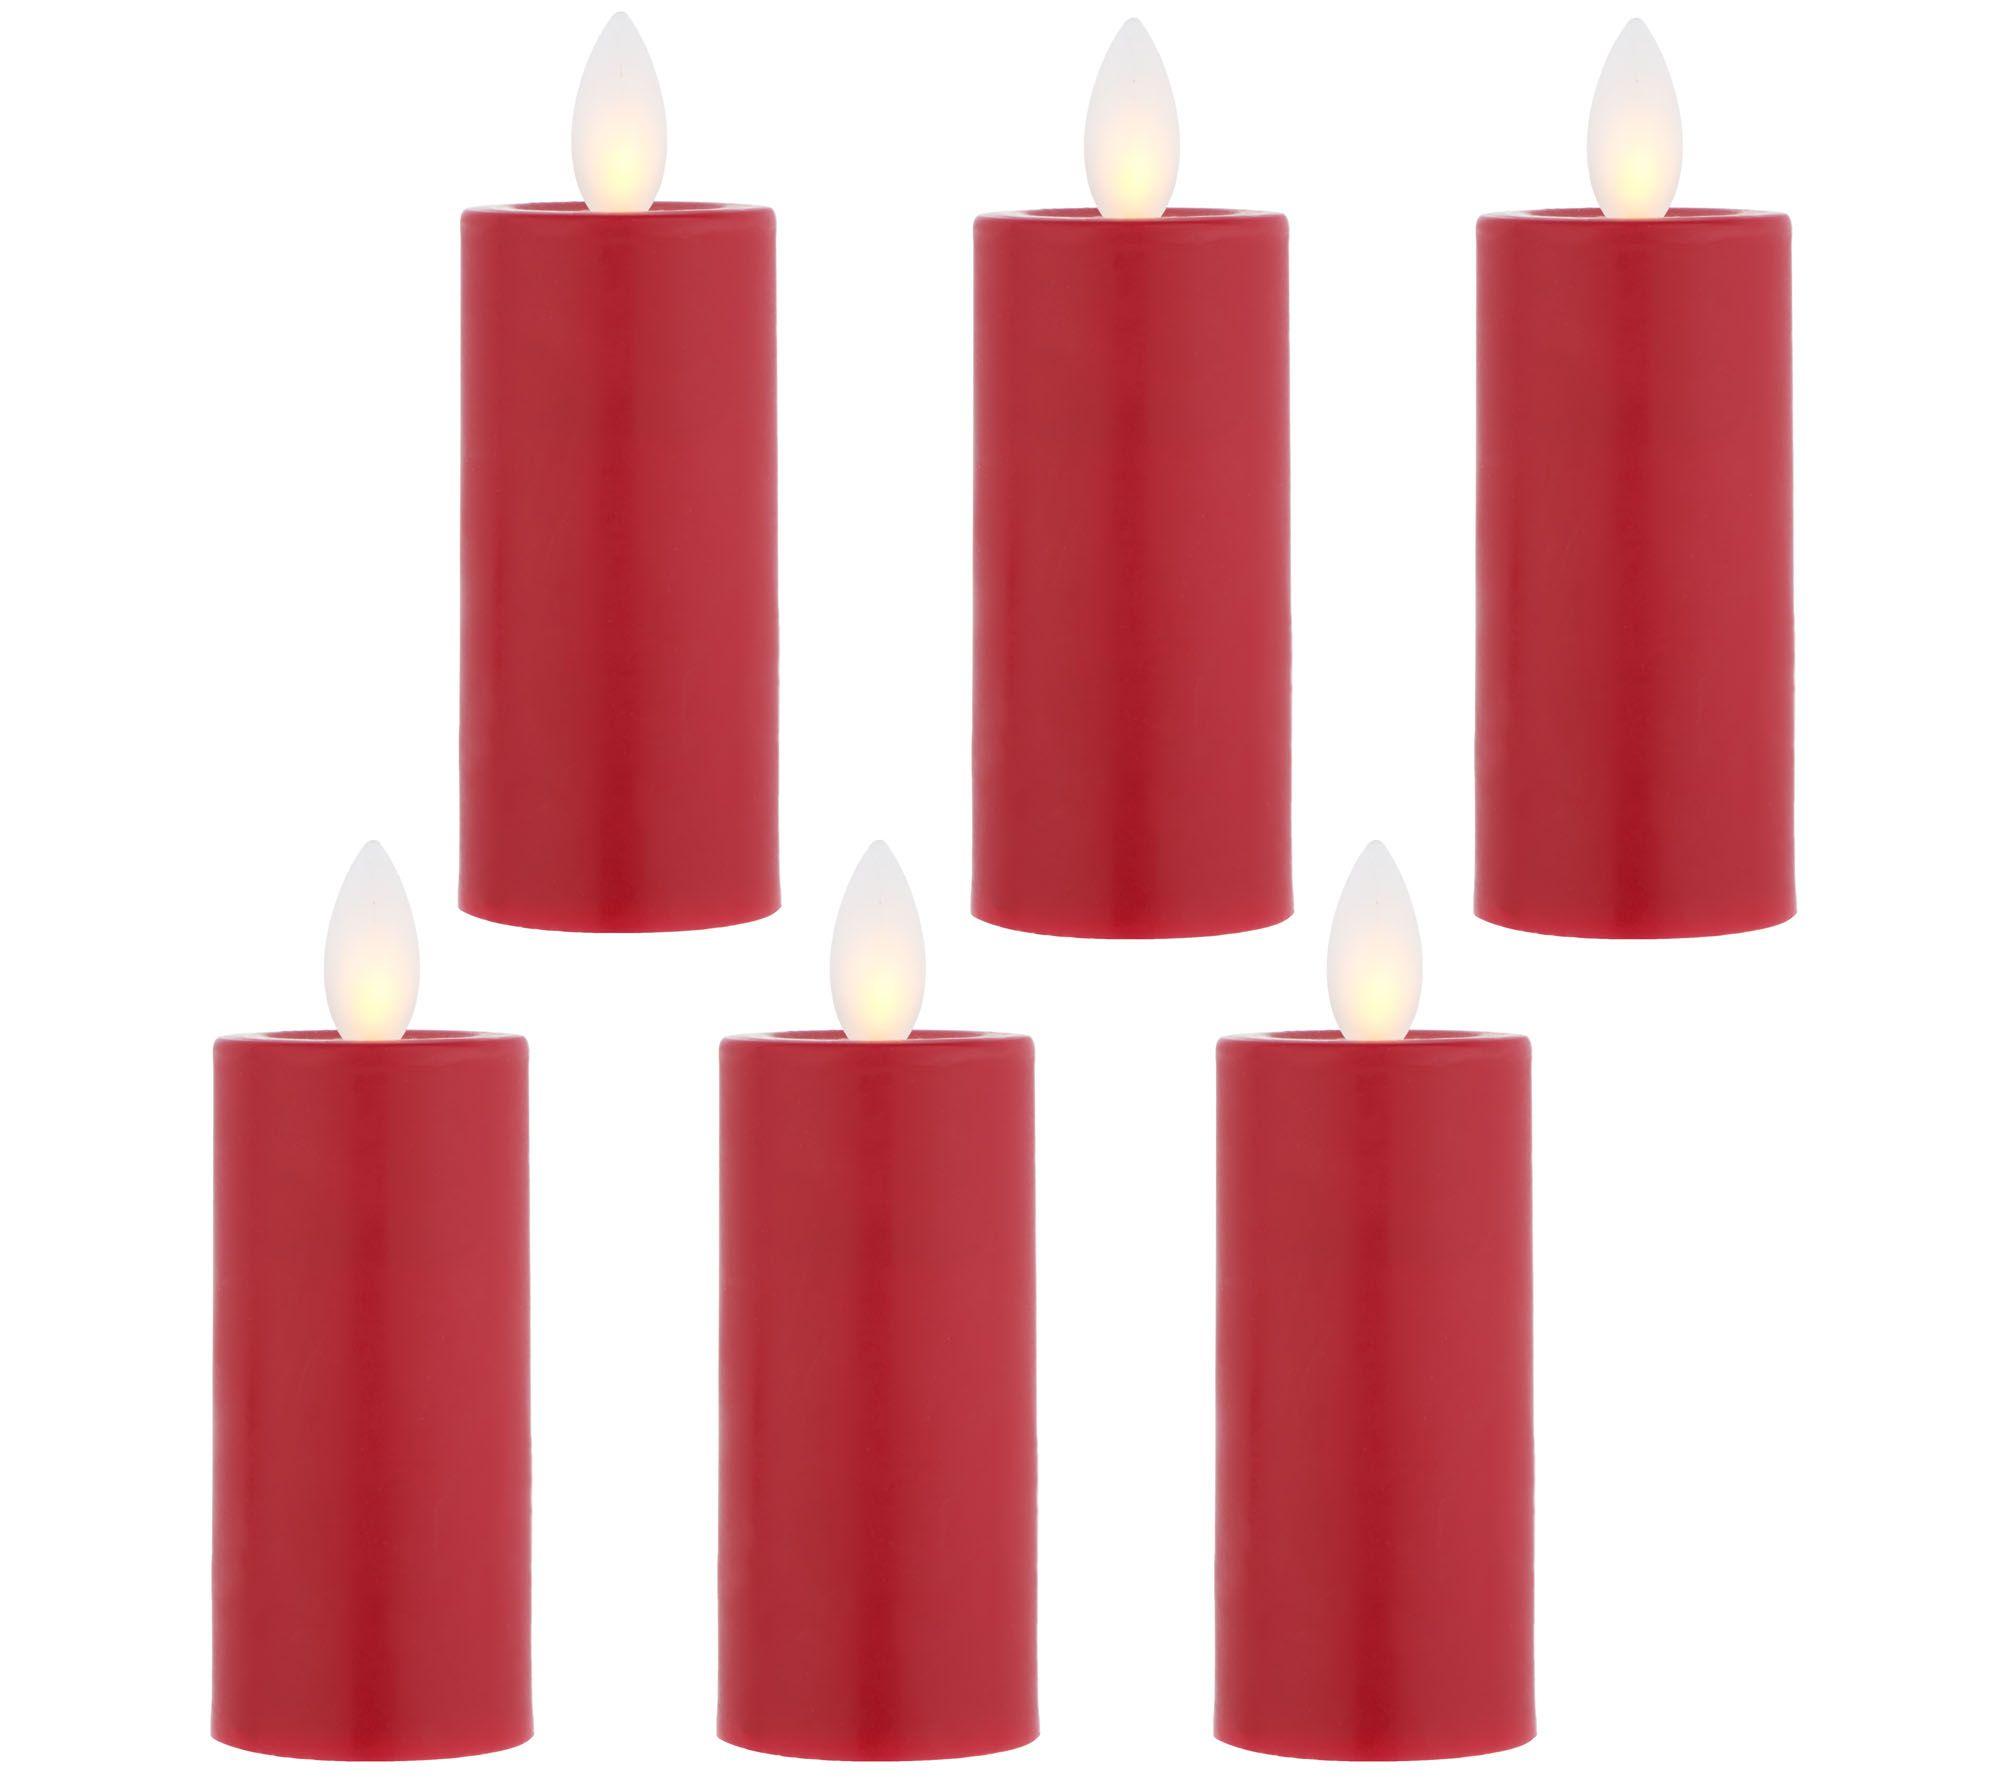 Candle Impressions Set of 6 Mirage Votives - H213761